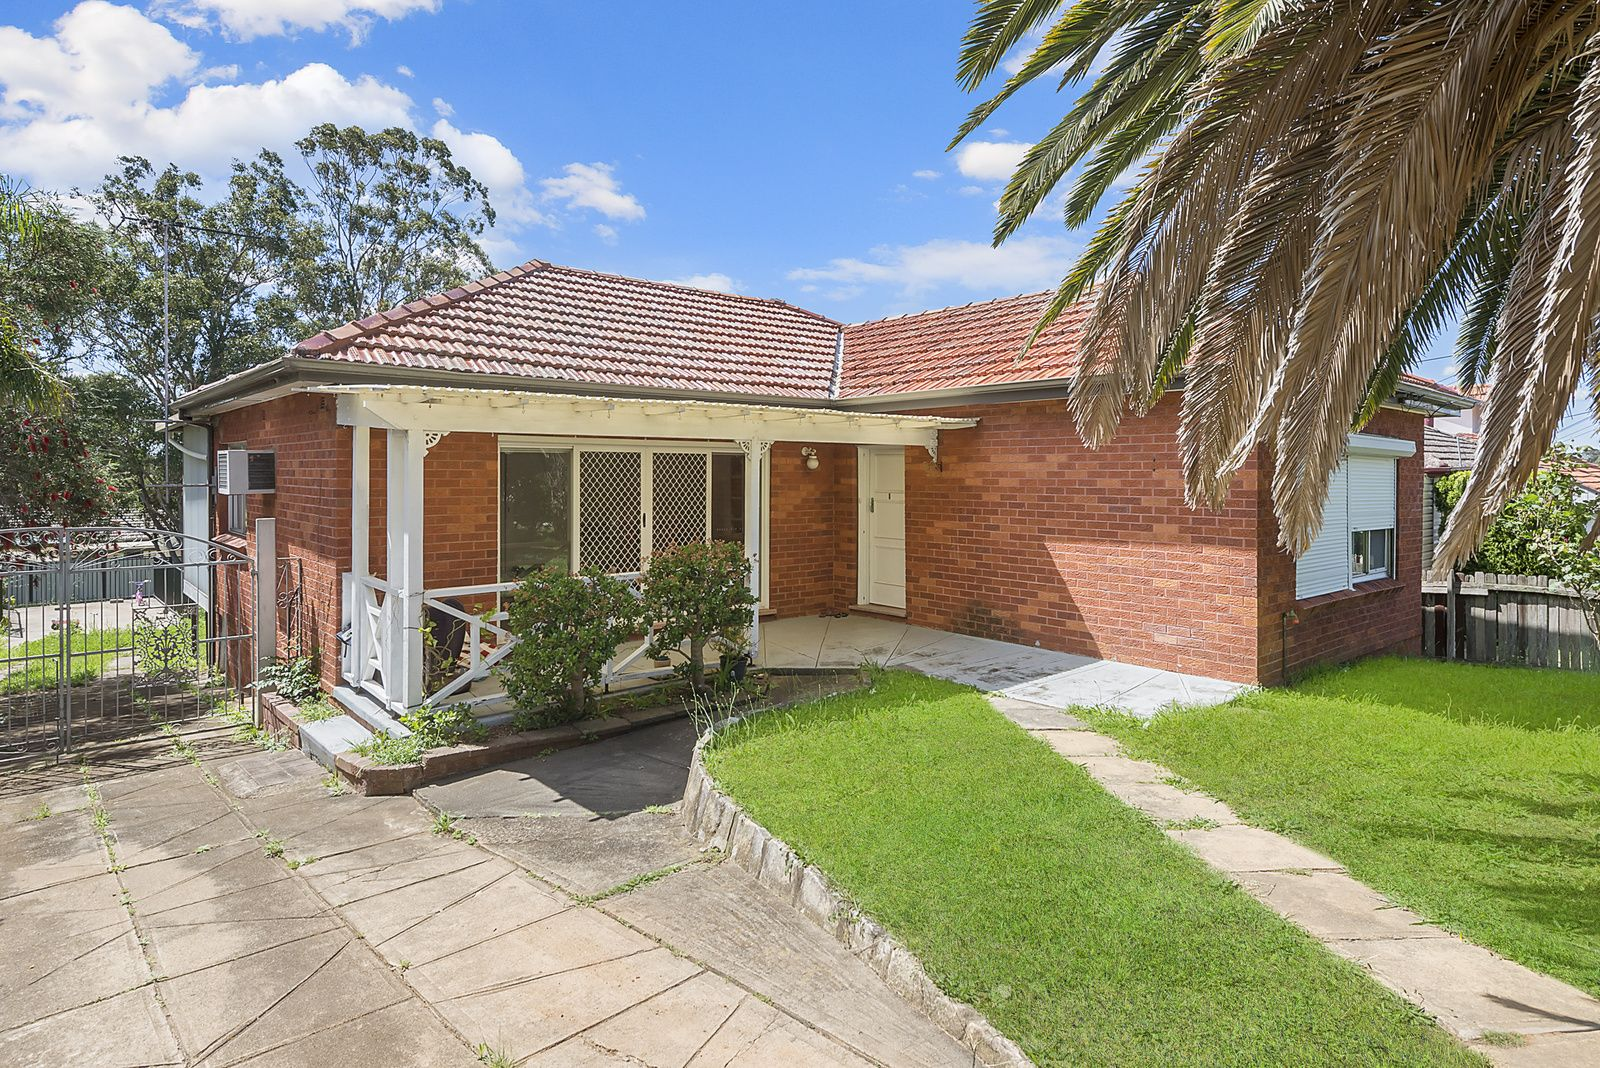 225 & 227 Bungarribee Road, Blacktown NSW 2148, Image 1